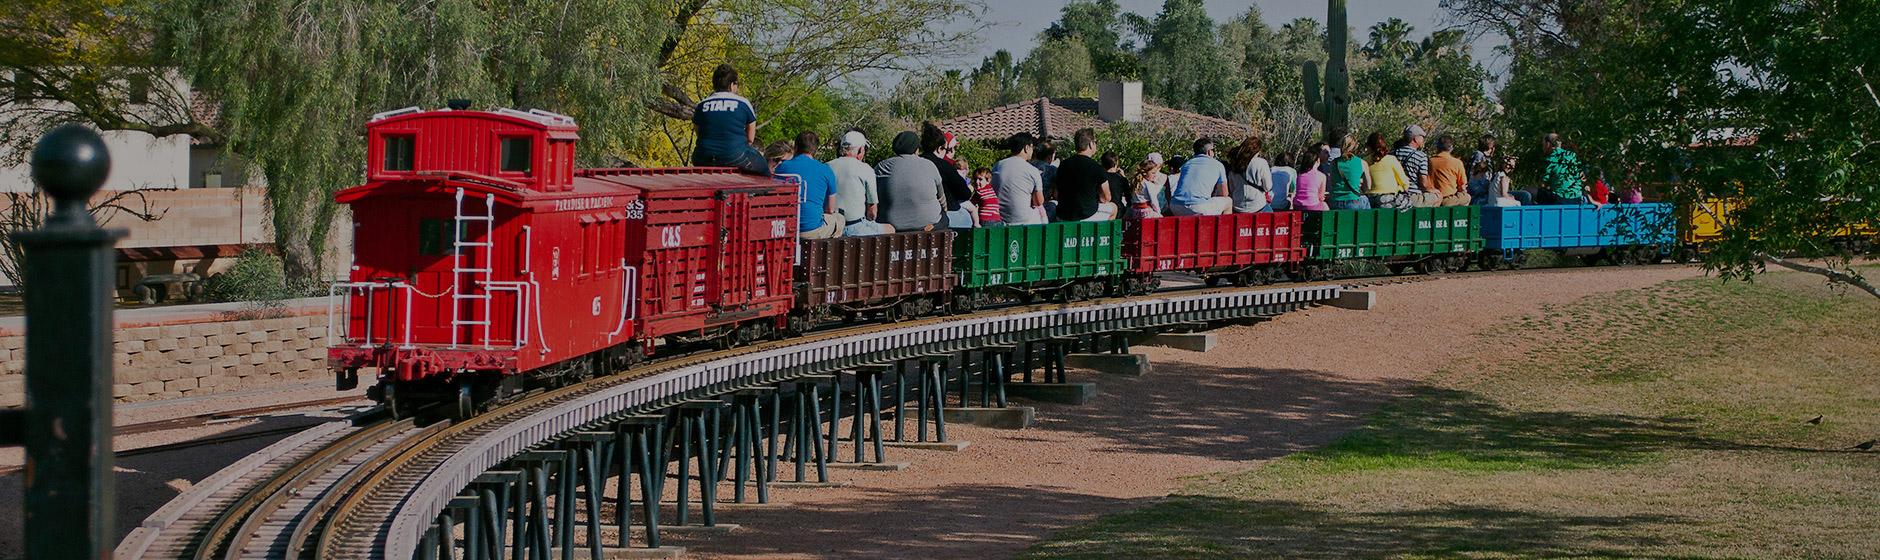 Rides at McCormick-Stillman Railroad Park